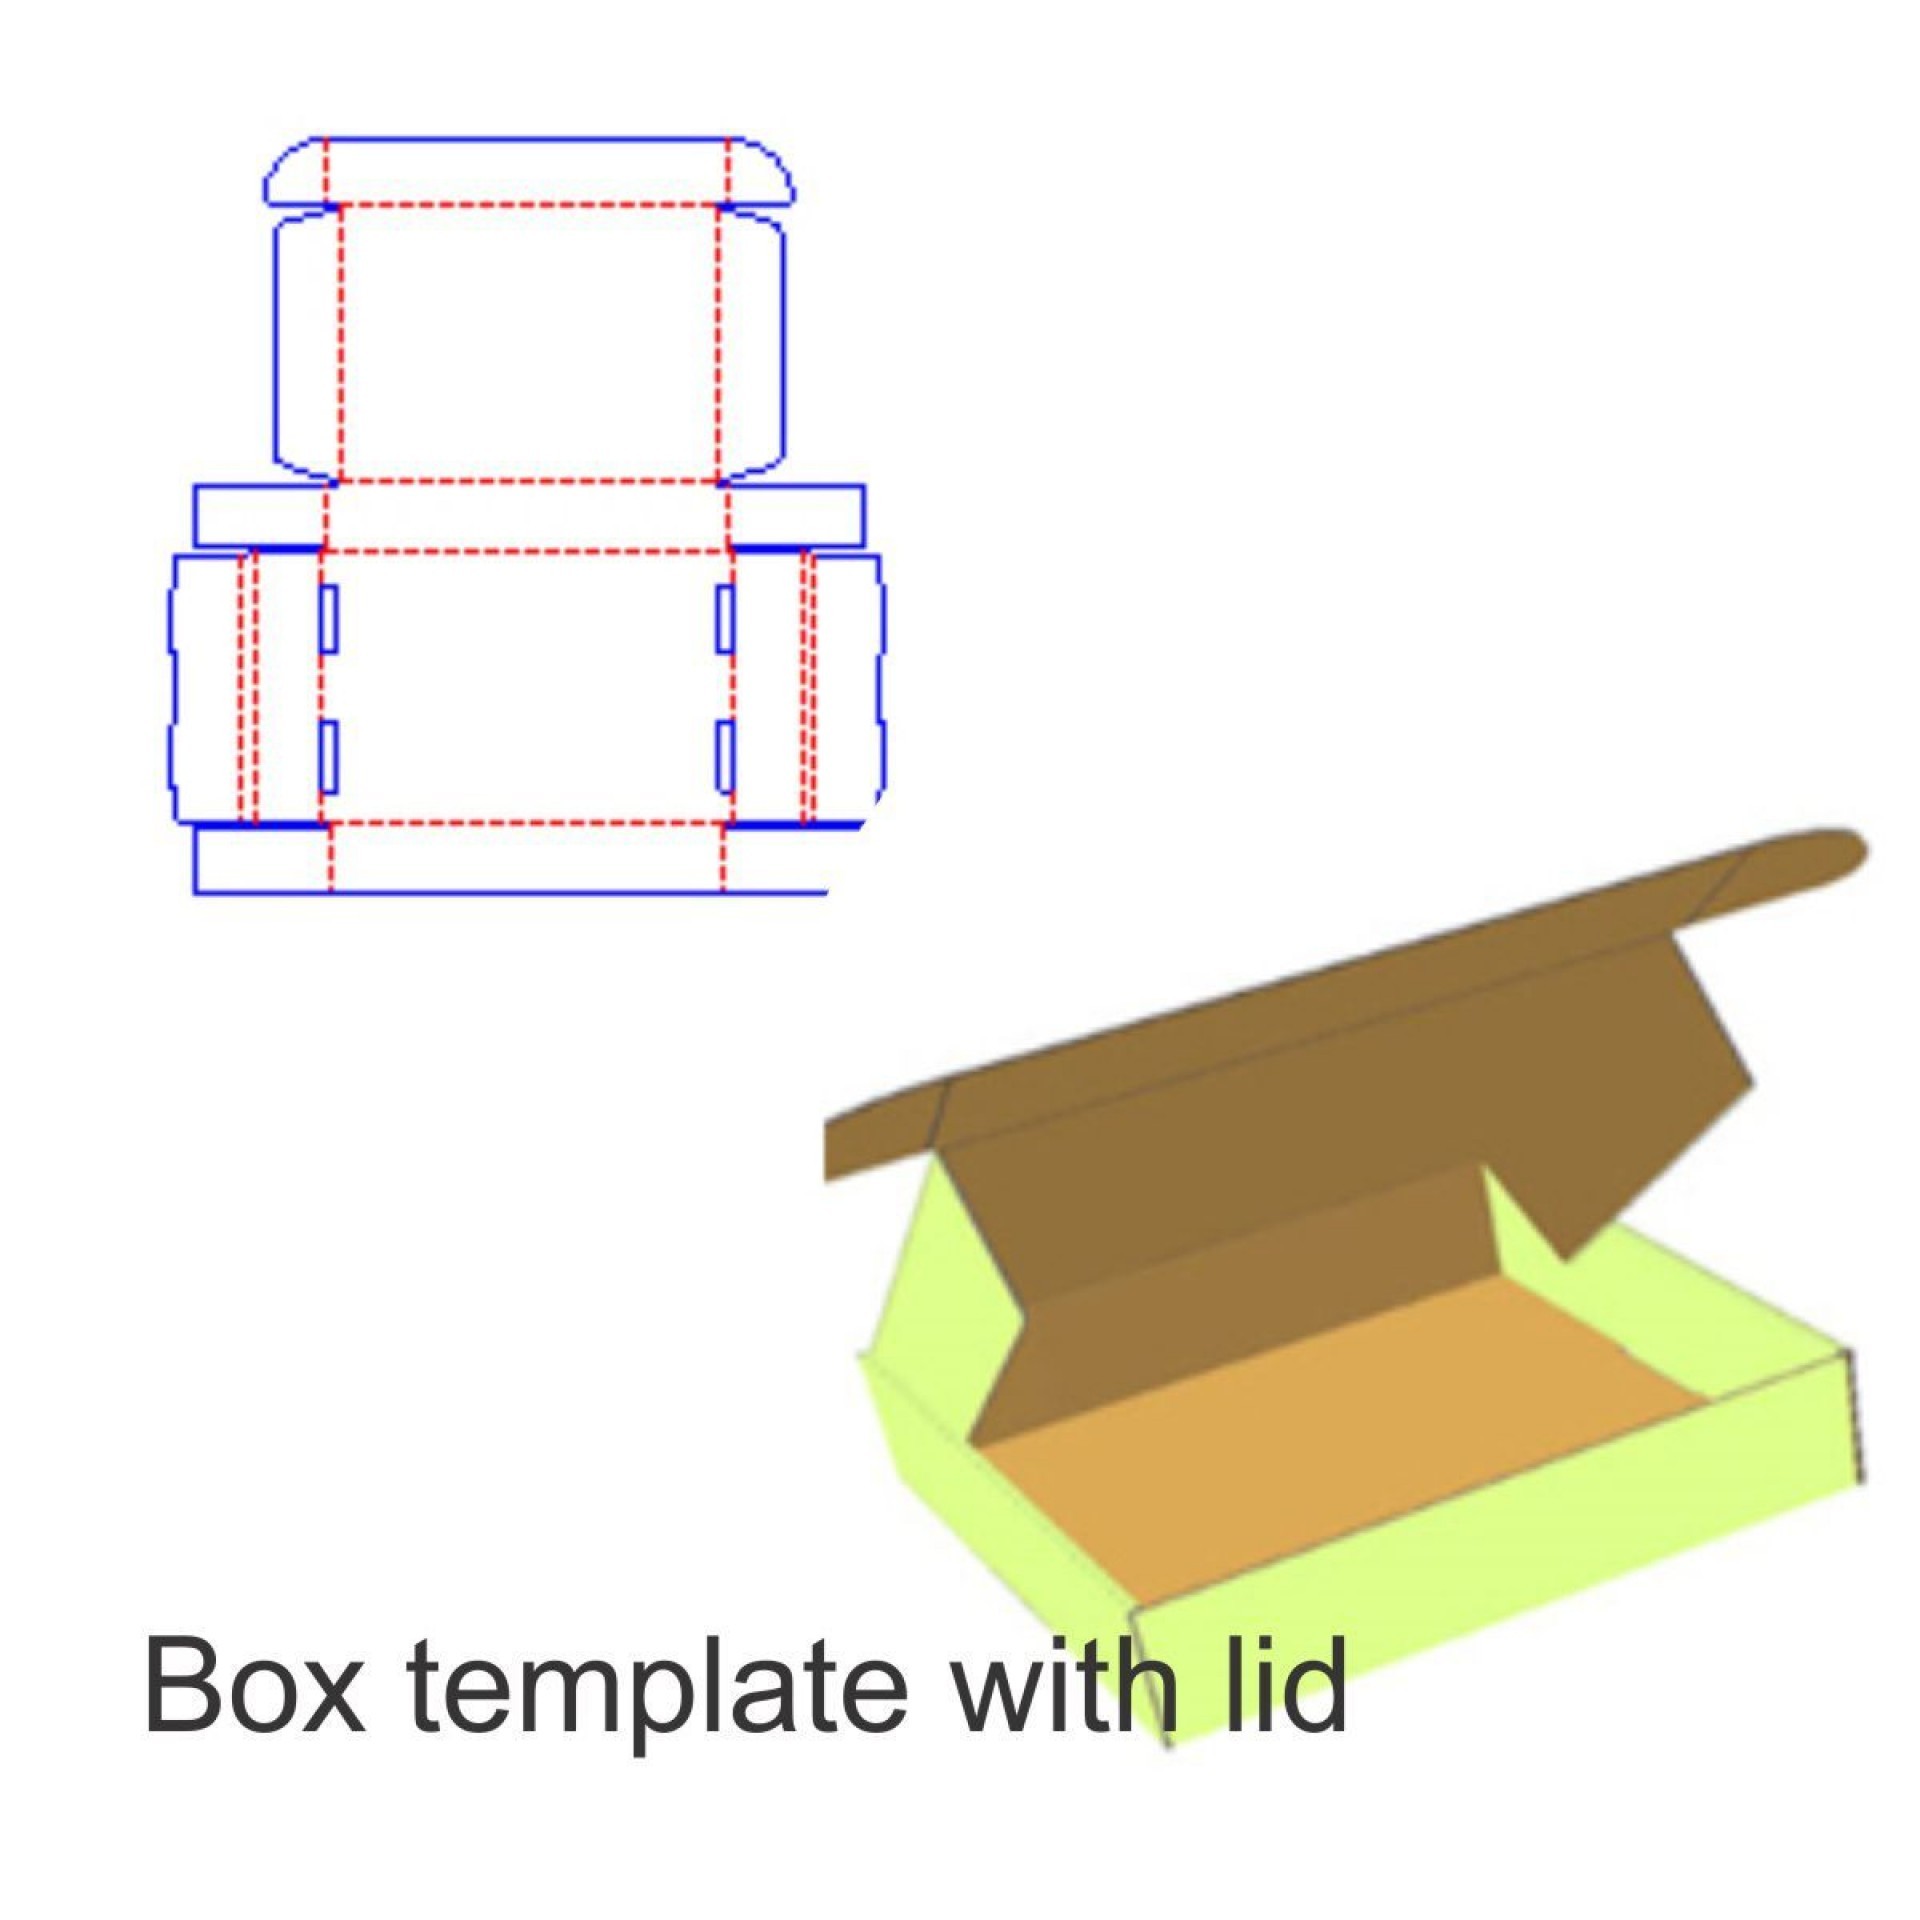 008 Unique Square Box Template Free Printable Example 1920